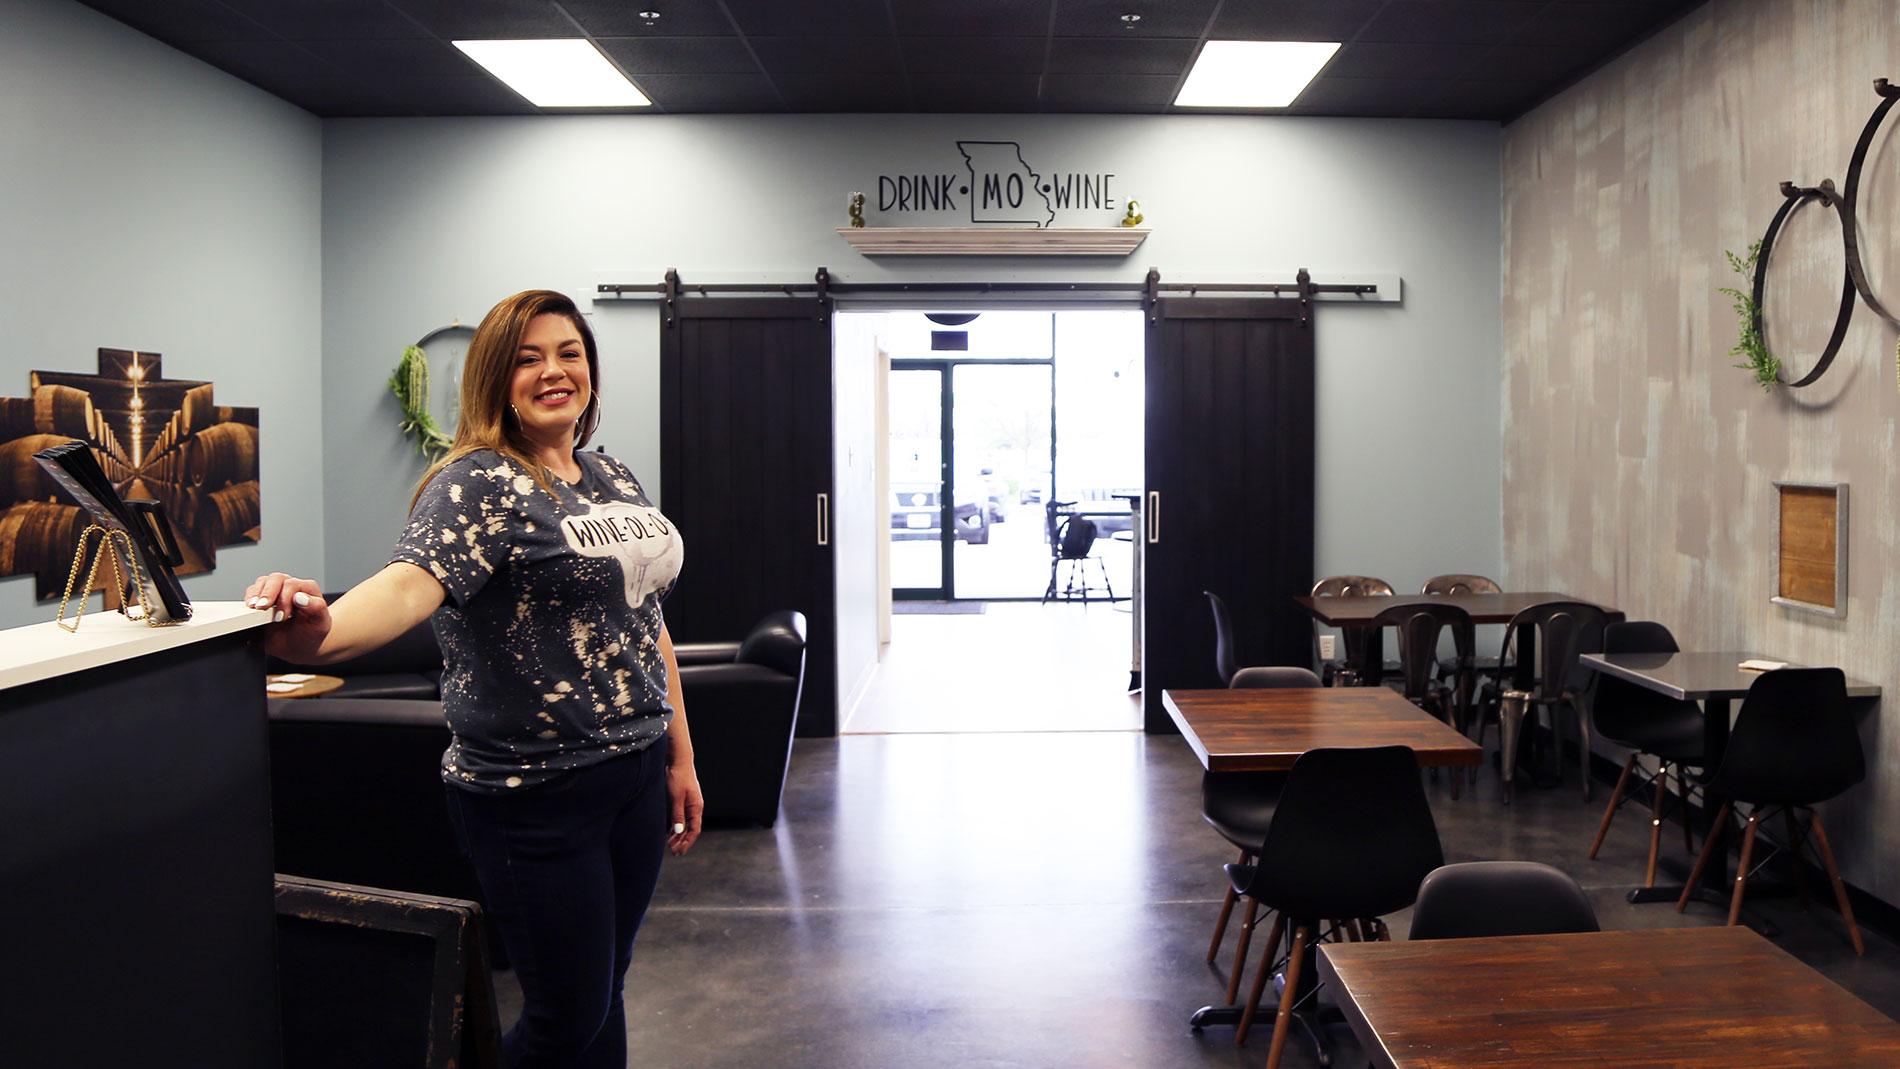 Wineology owner and operator Lori Cheatham